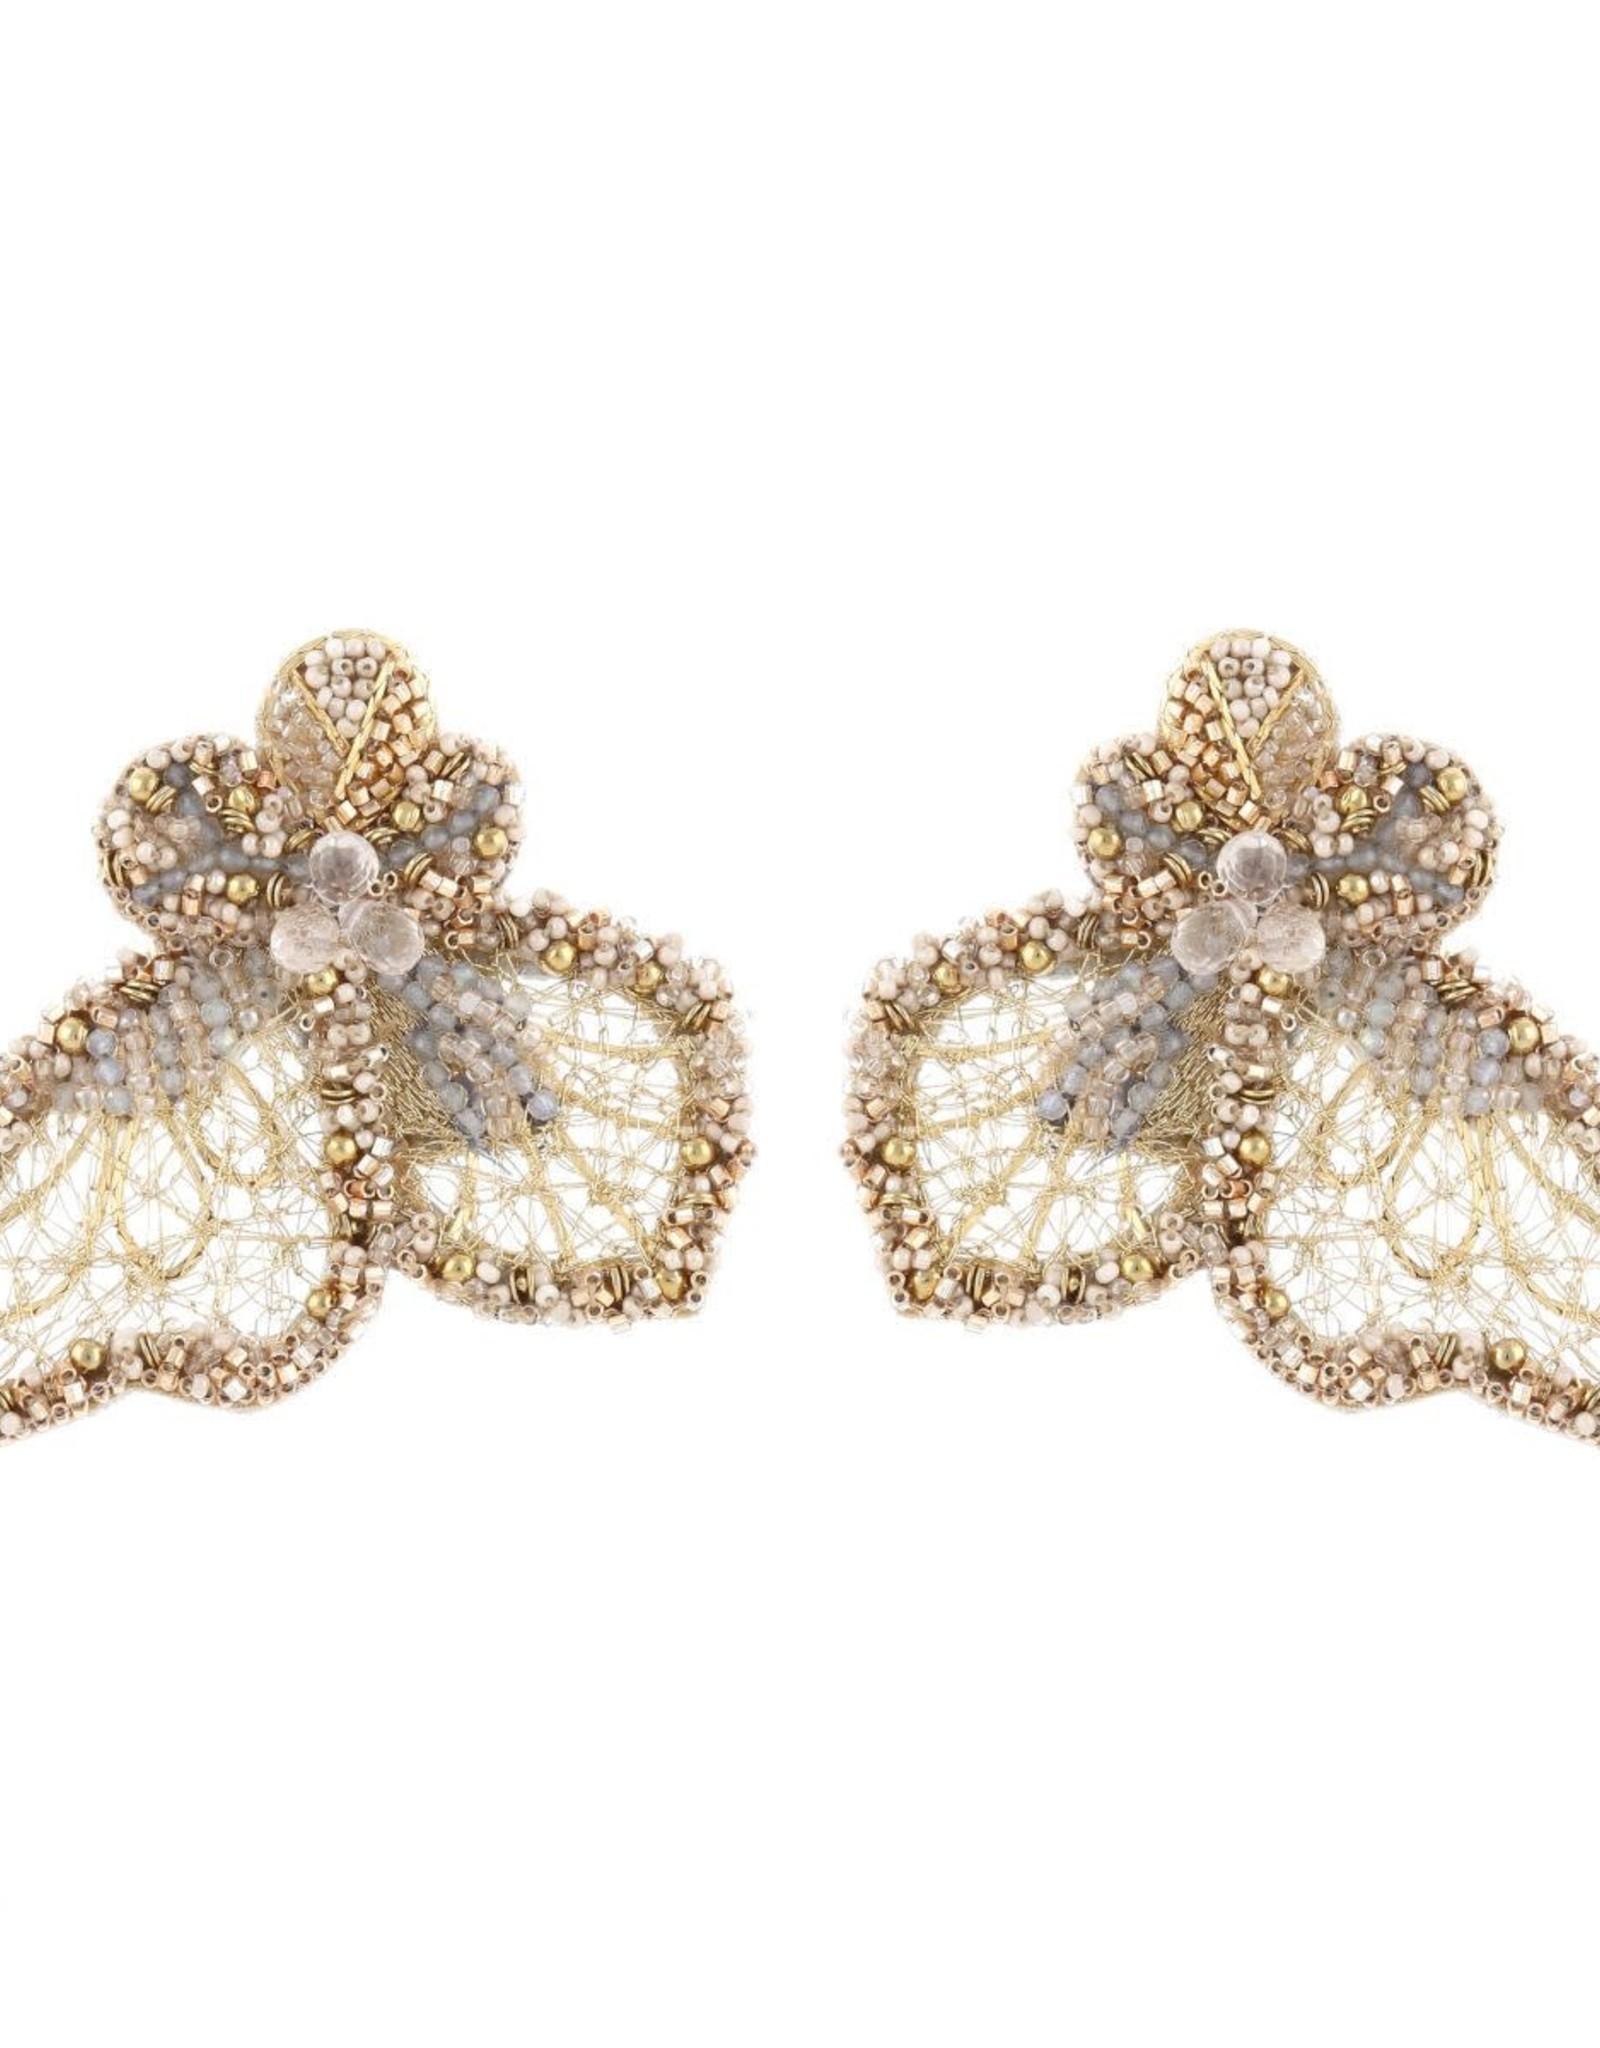 Deepa Gurnani Deepa Gurnani Clare Filigree Leaf Earrings CLIP-ON